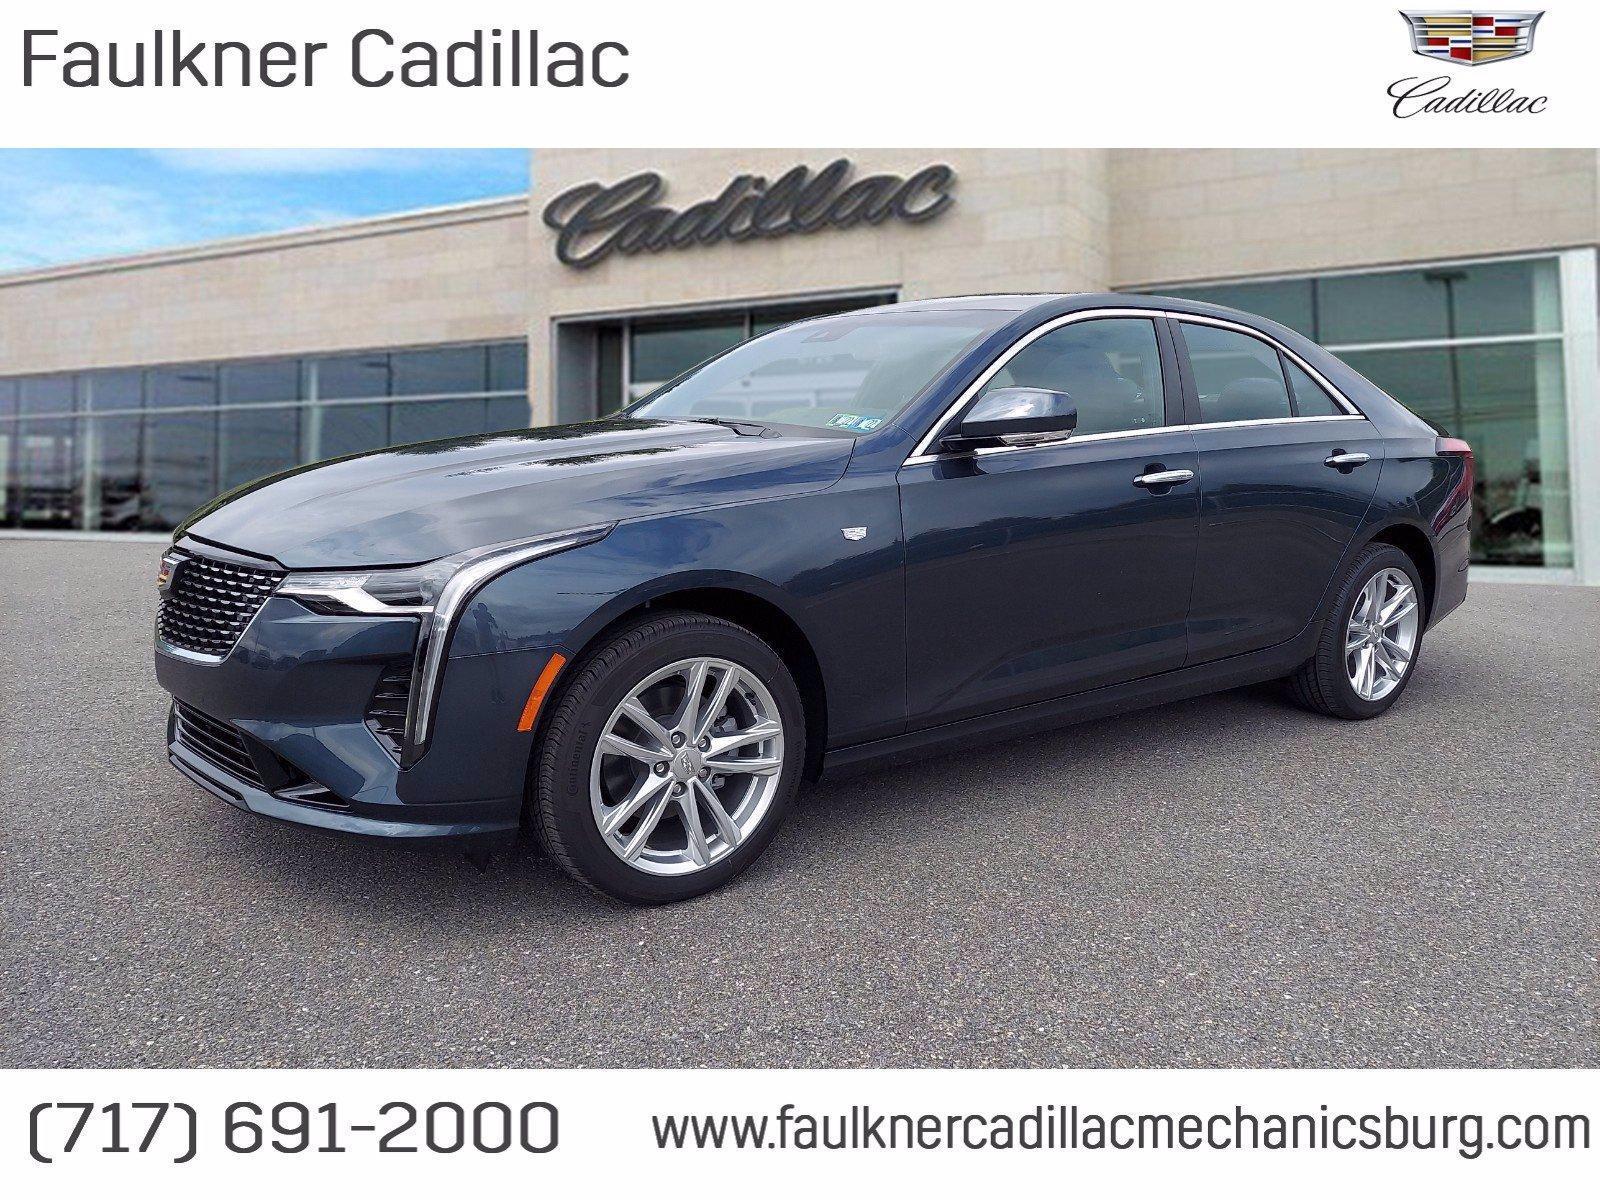 2021 Cadillac CT4 Vehicle Photo in Mechanicsburg, PA 17050